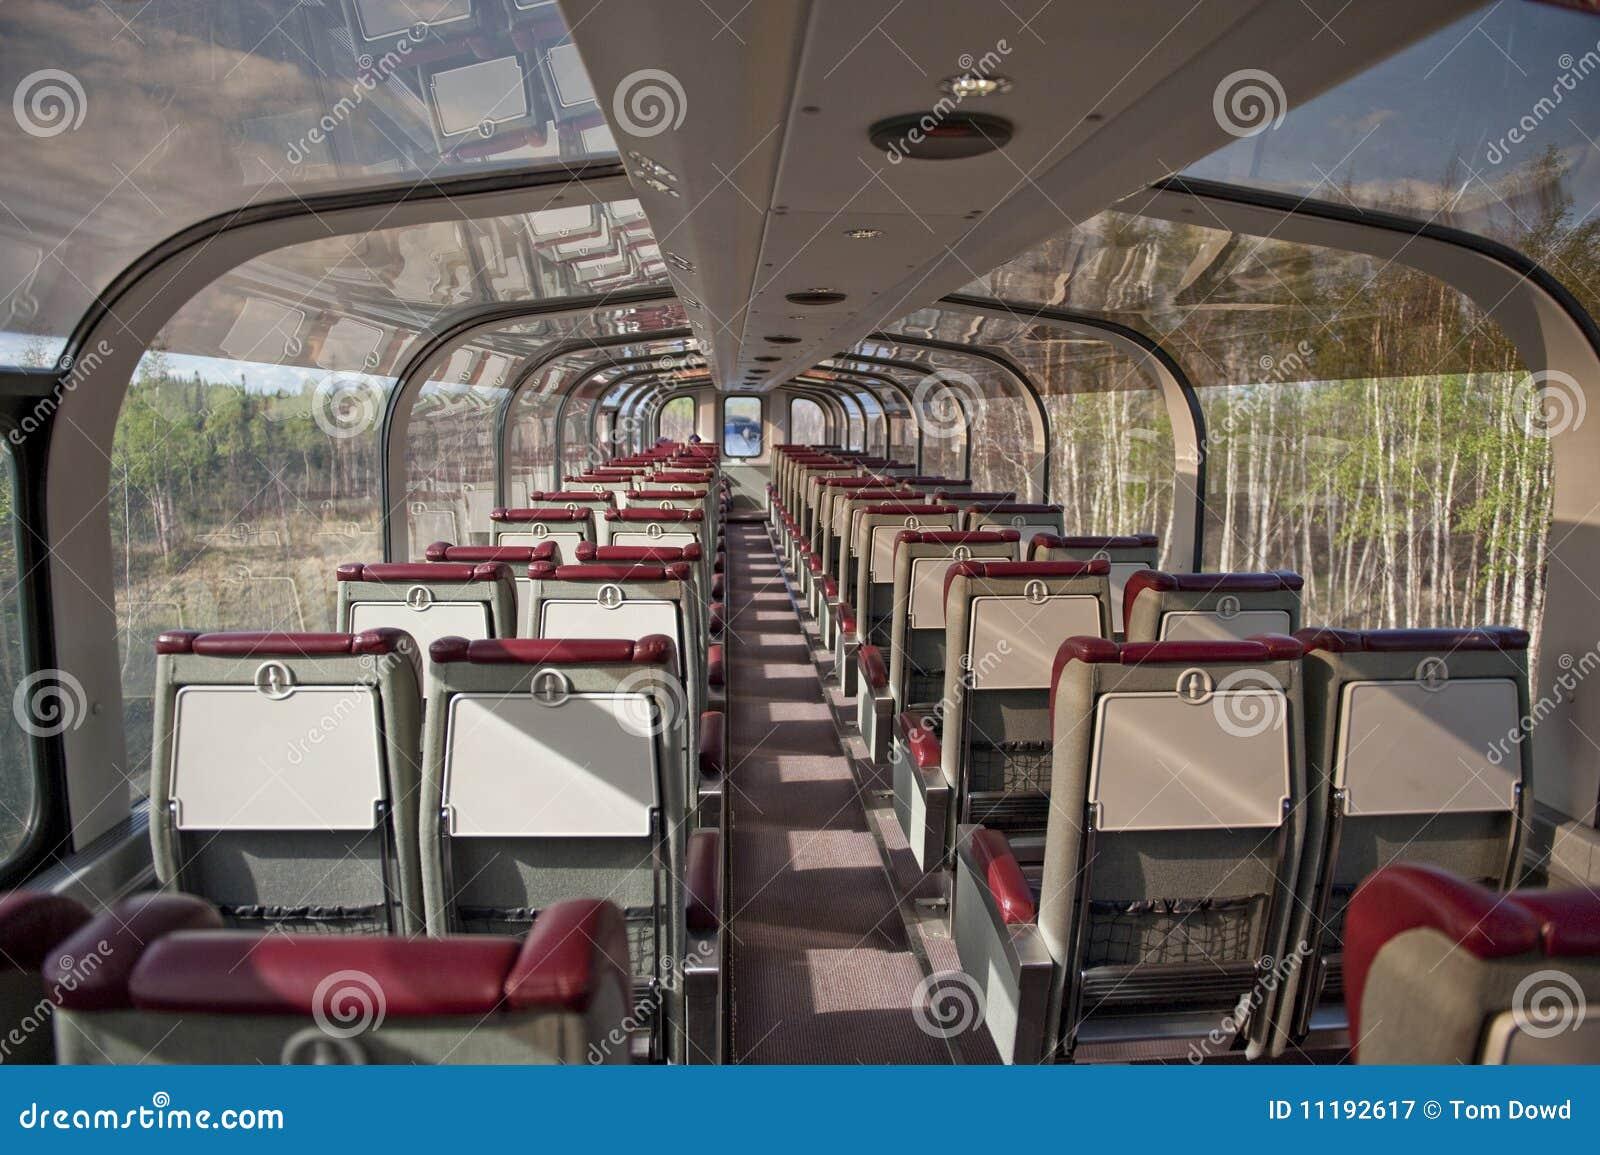 alaska railroad passenger car royalty free stock photography image 11192617. Black Bedroom Furniture Sets. Home Design Ideas